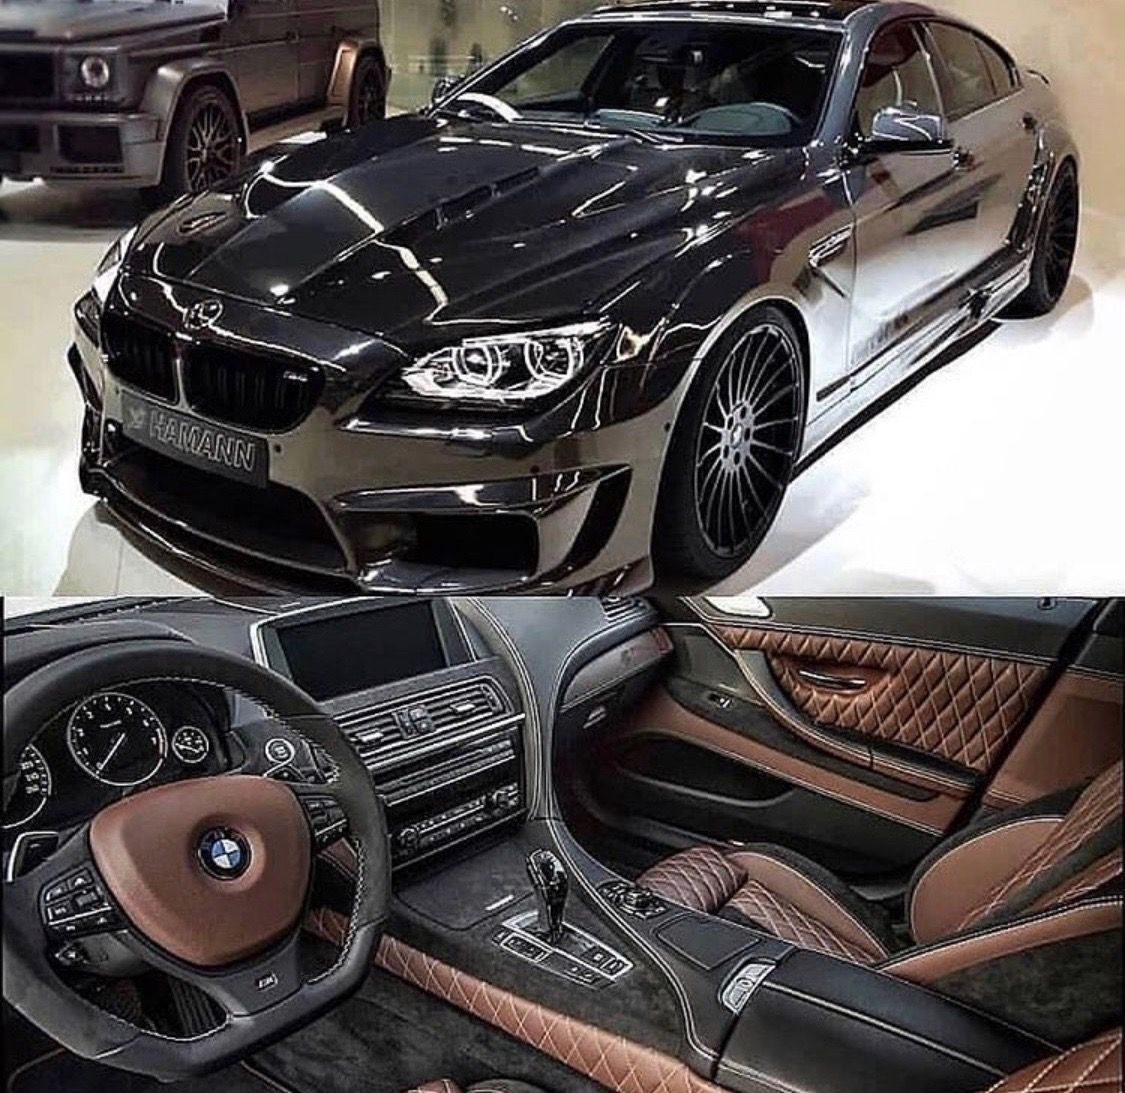 Bmw M6 Gran Coupe Black Chocolate Two Tone Audi Rs Bmw Bmw 650i